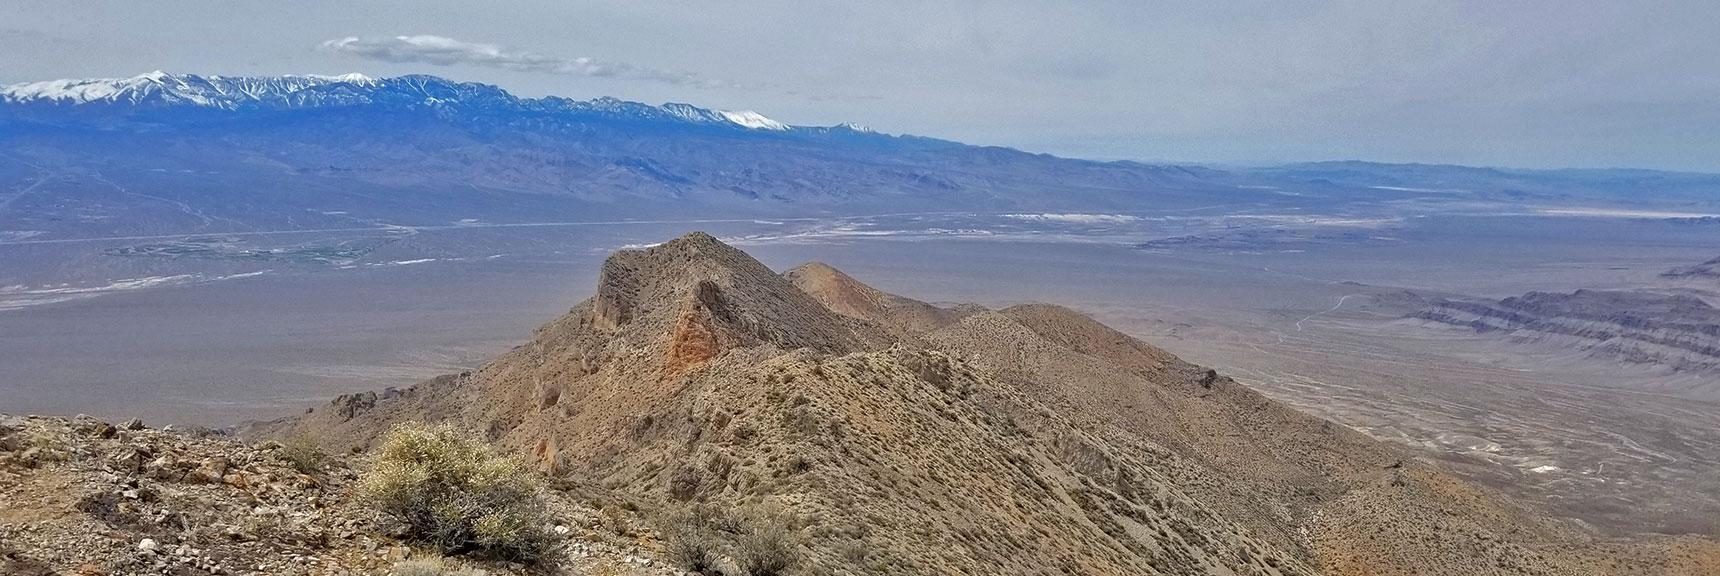 View West Along the Gass Peak Gauntlet from Gass Peak Eastern Summit | Gass Peak Eastern Summit Ultra-marathon Adventure, Nevada